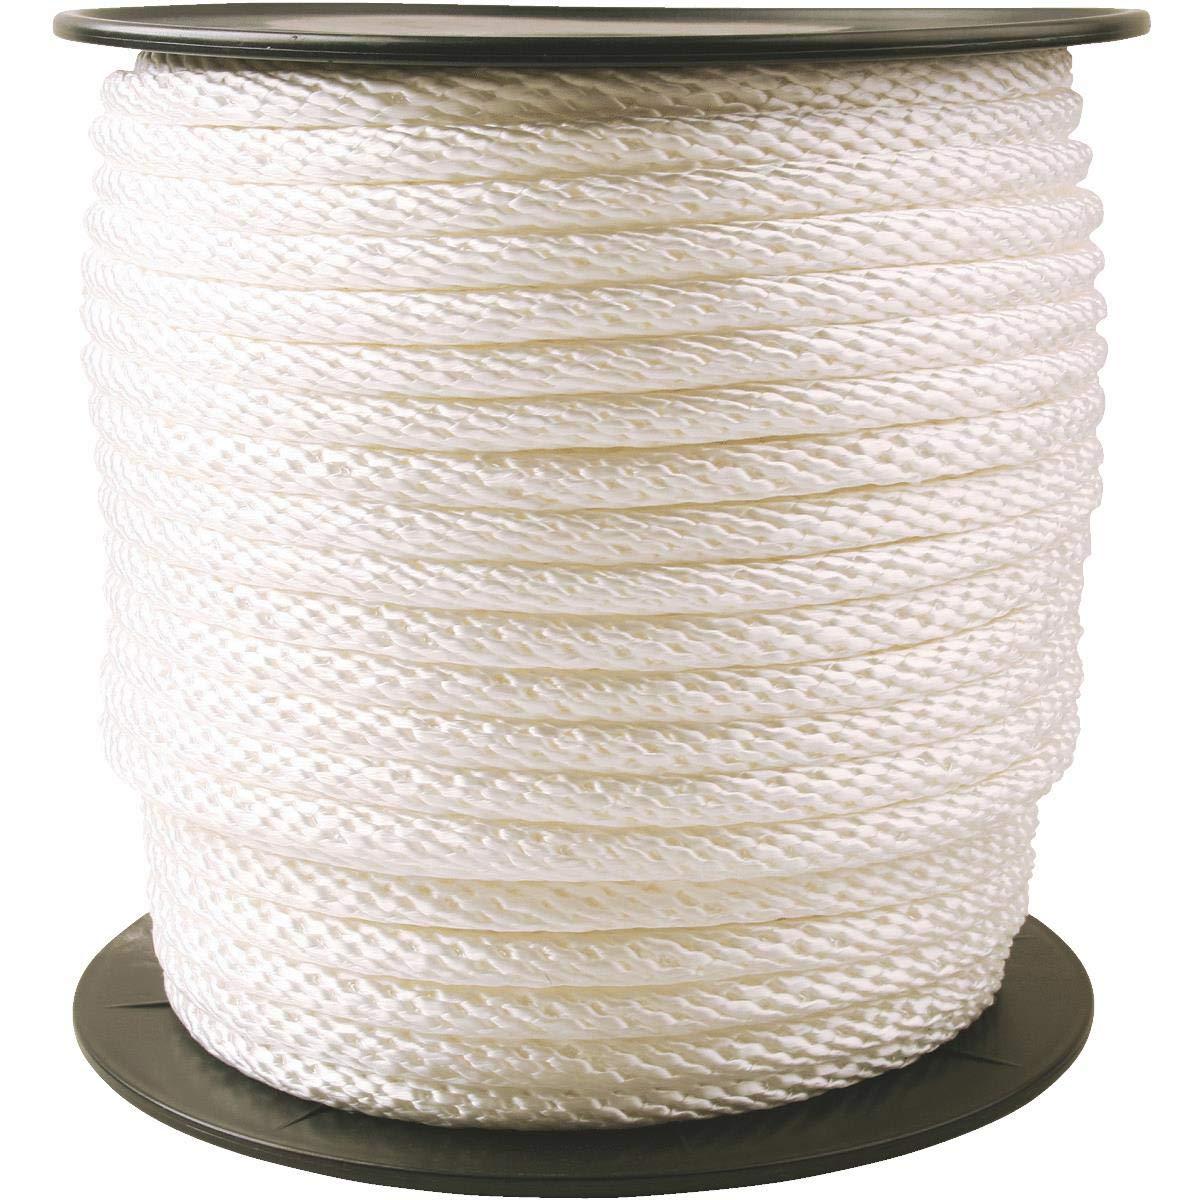 Do It Best Global Sourcing - Rope 736644 Nylon, 1/2'' X250' NYL Braid Rope